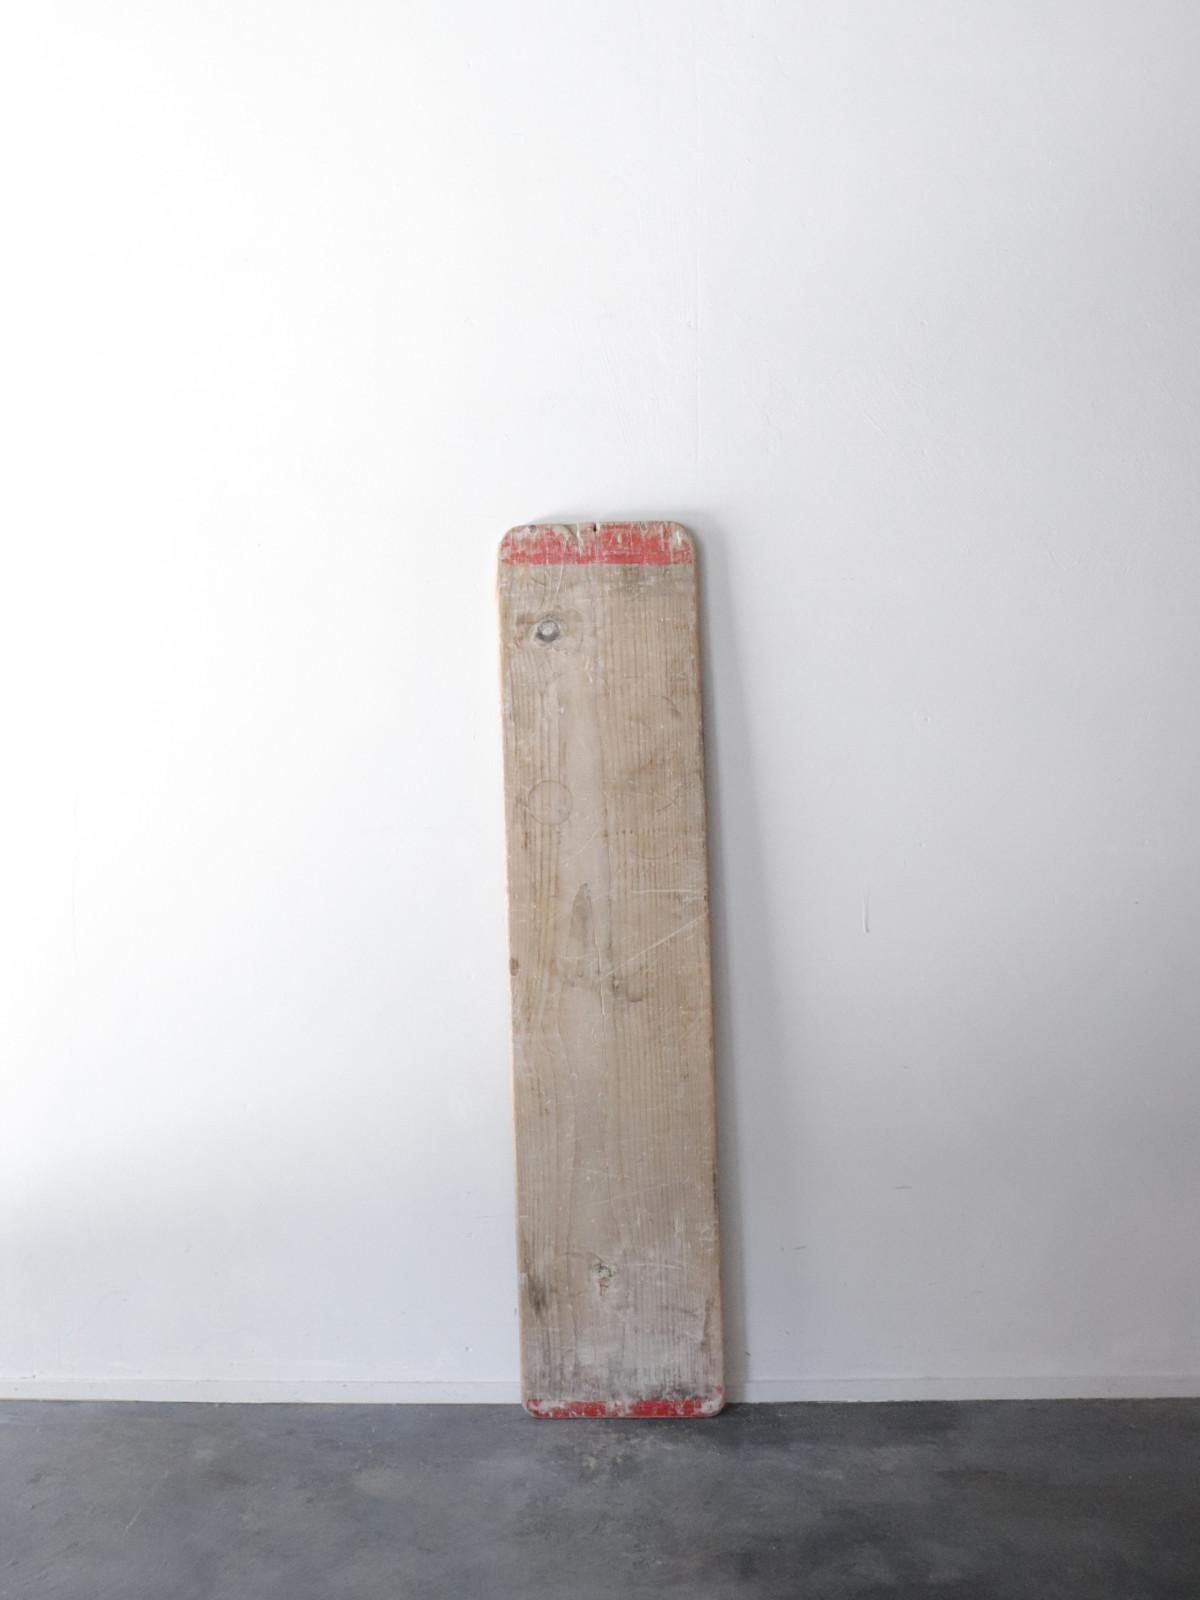 Wood board, England, Vintage